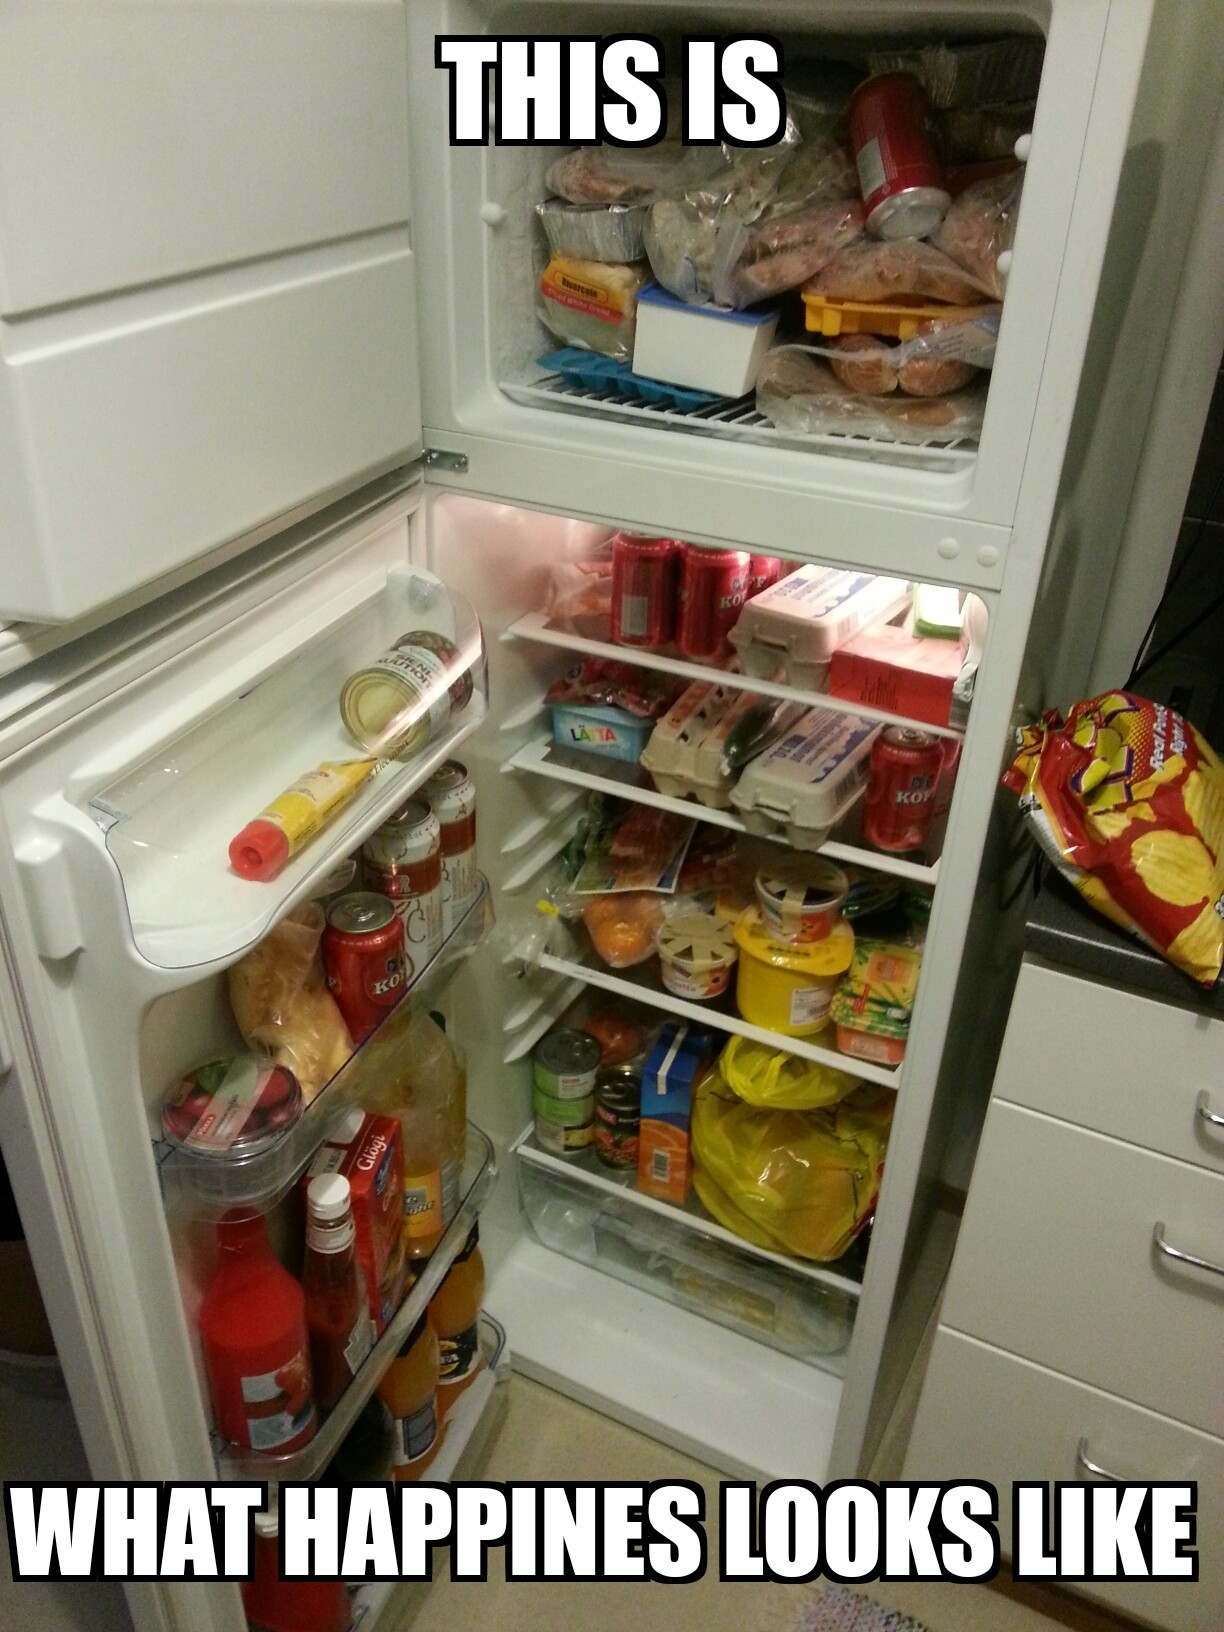 Picture of my fridge. Christmas 2013. - meme